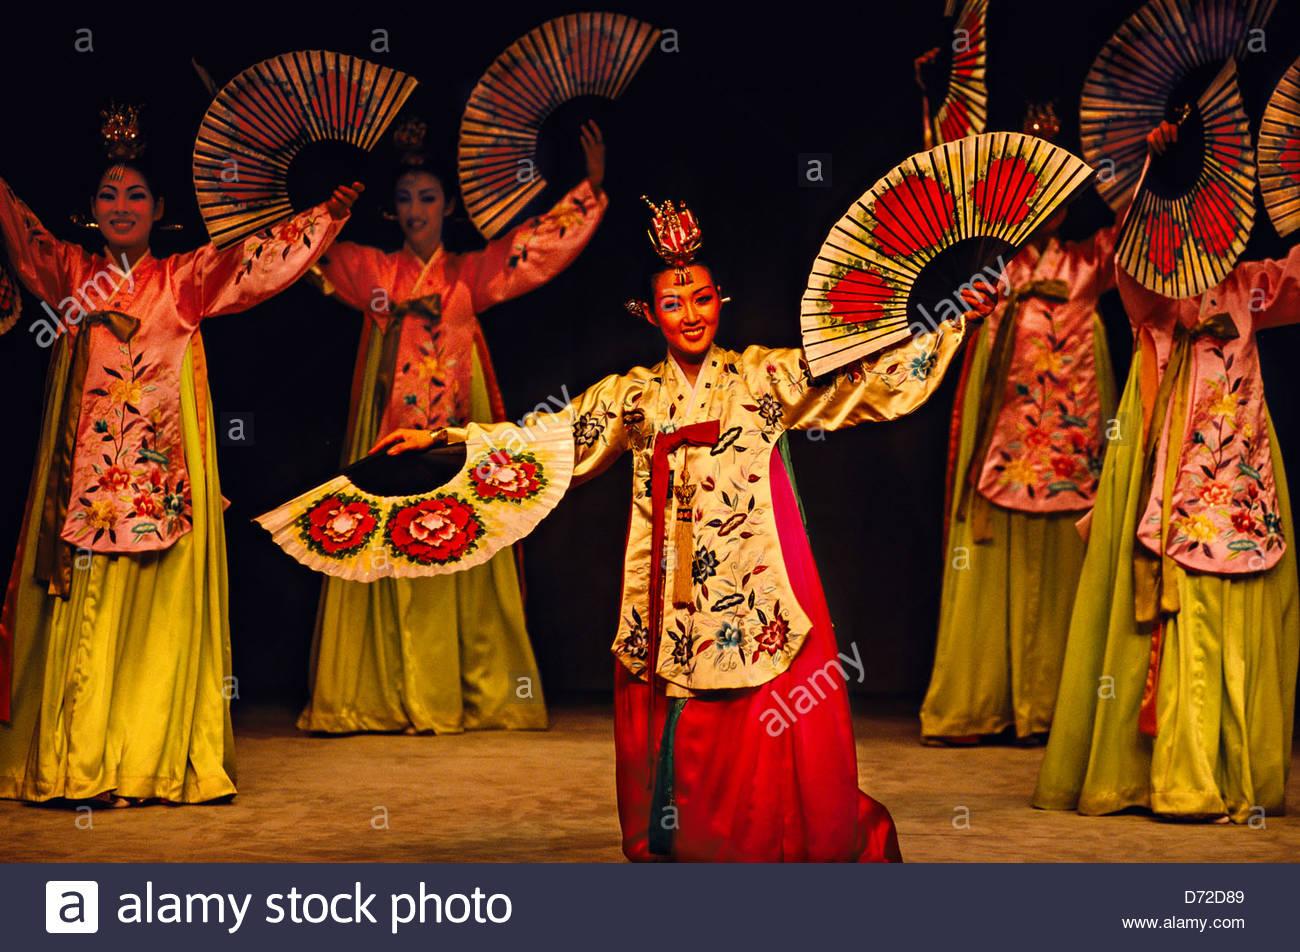 Korean traditional music and dance performance. Korea House. Seoul Stock Photo. Royalty Free Image: 55988025 - Alamy